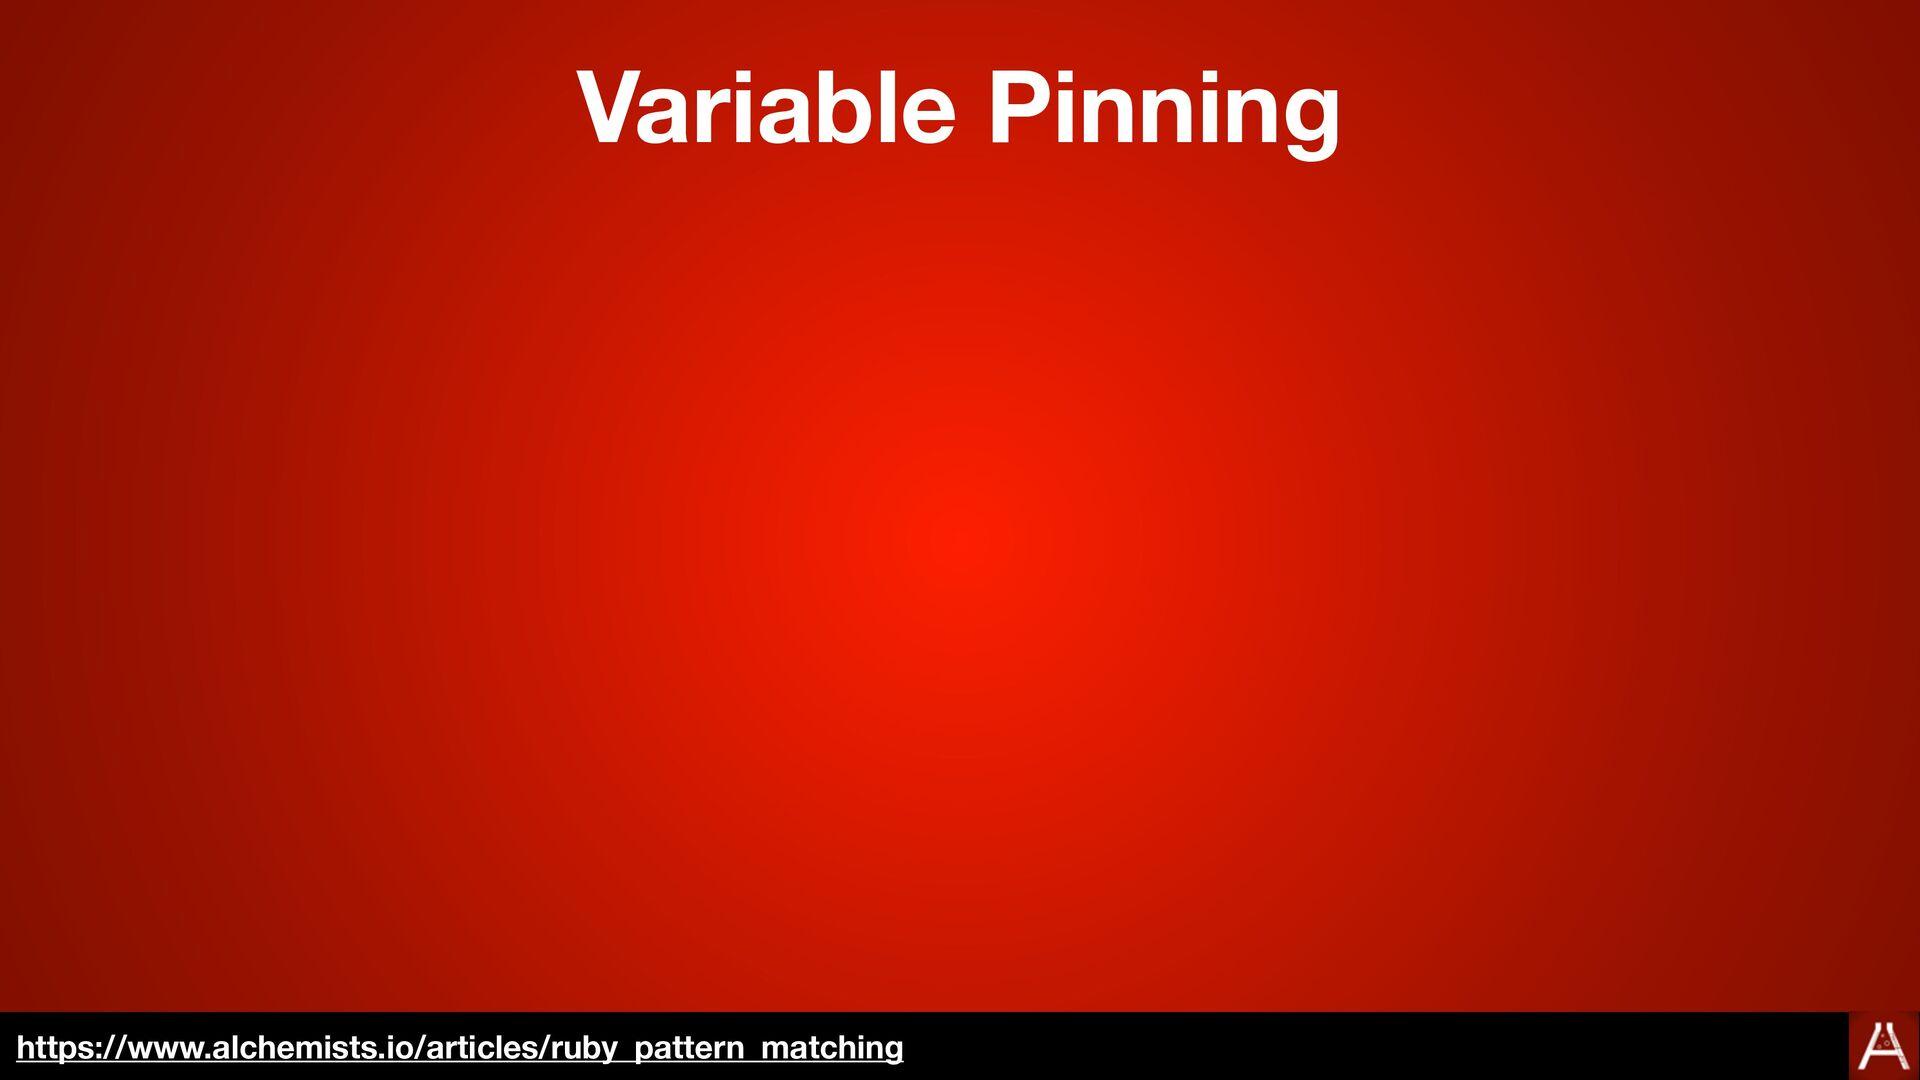 "case [1, 2, 3 ]  in first, *remainder then ""mat..."